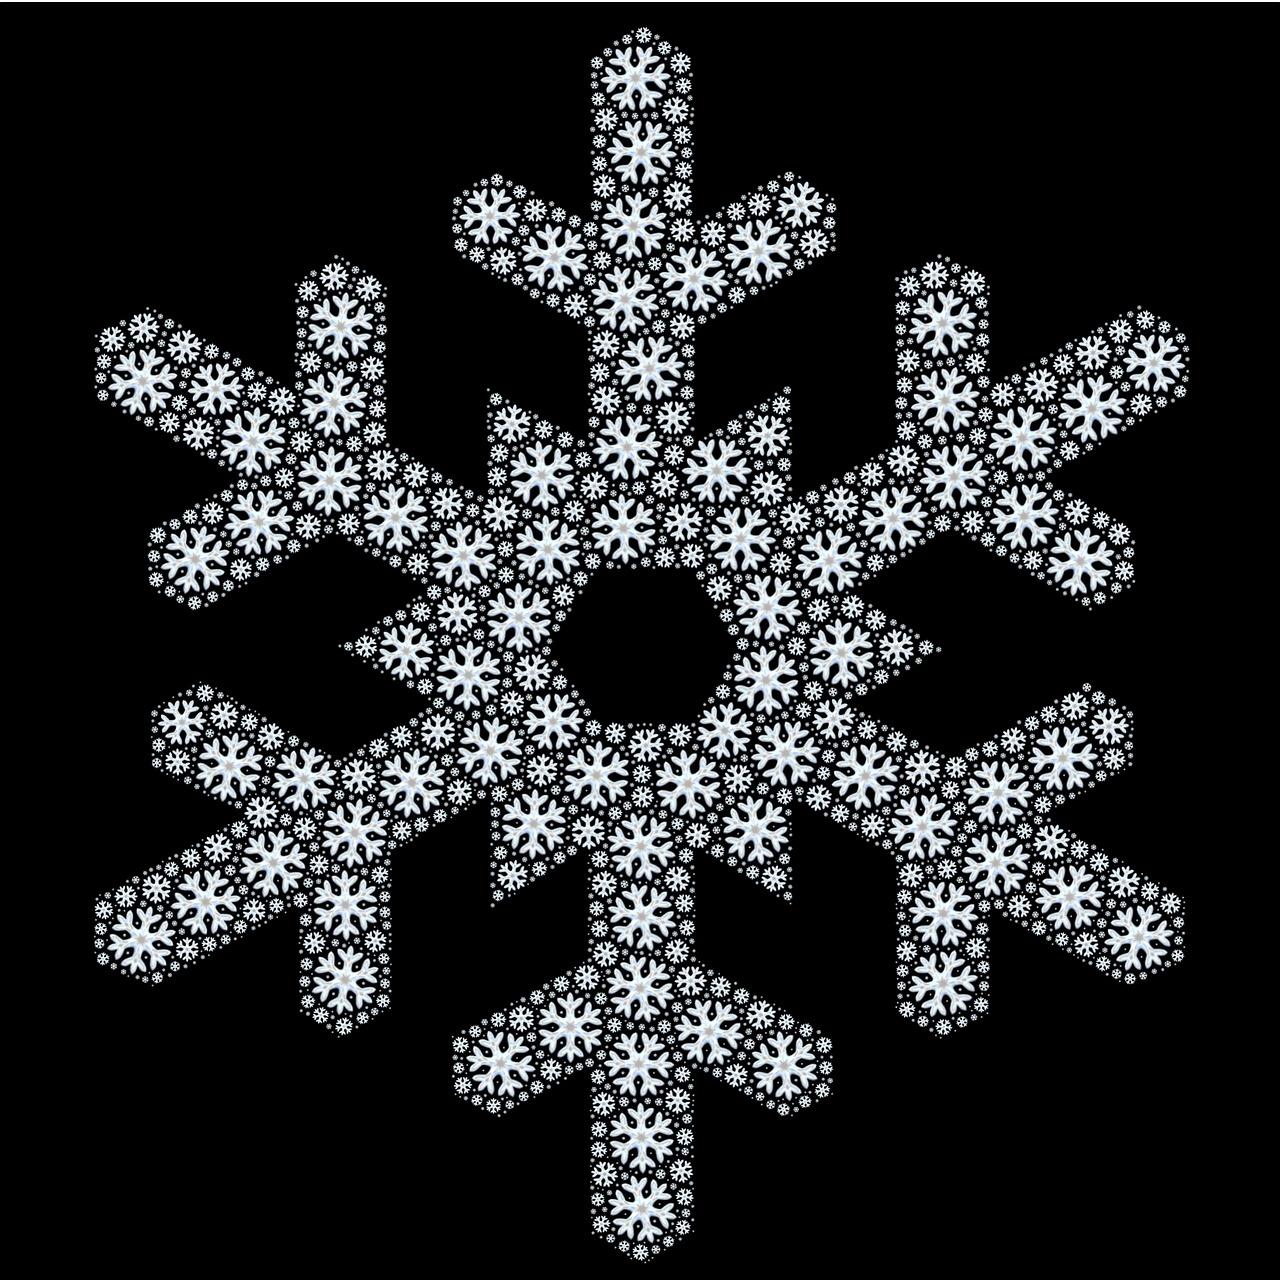 Snowflakeabstractpatternshapesnow Free Photo From Needpix